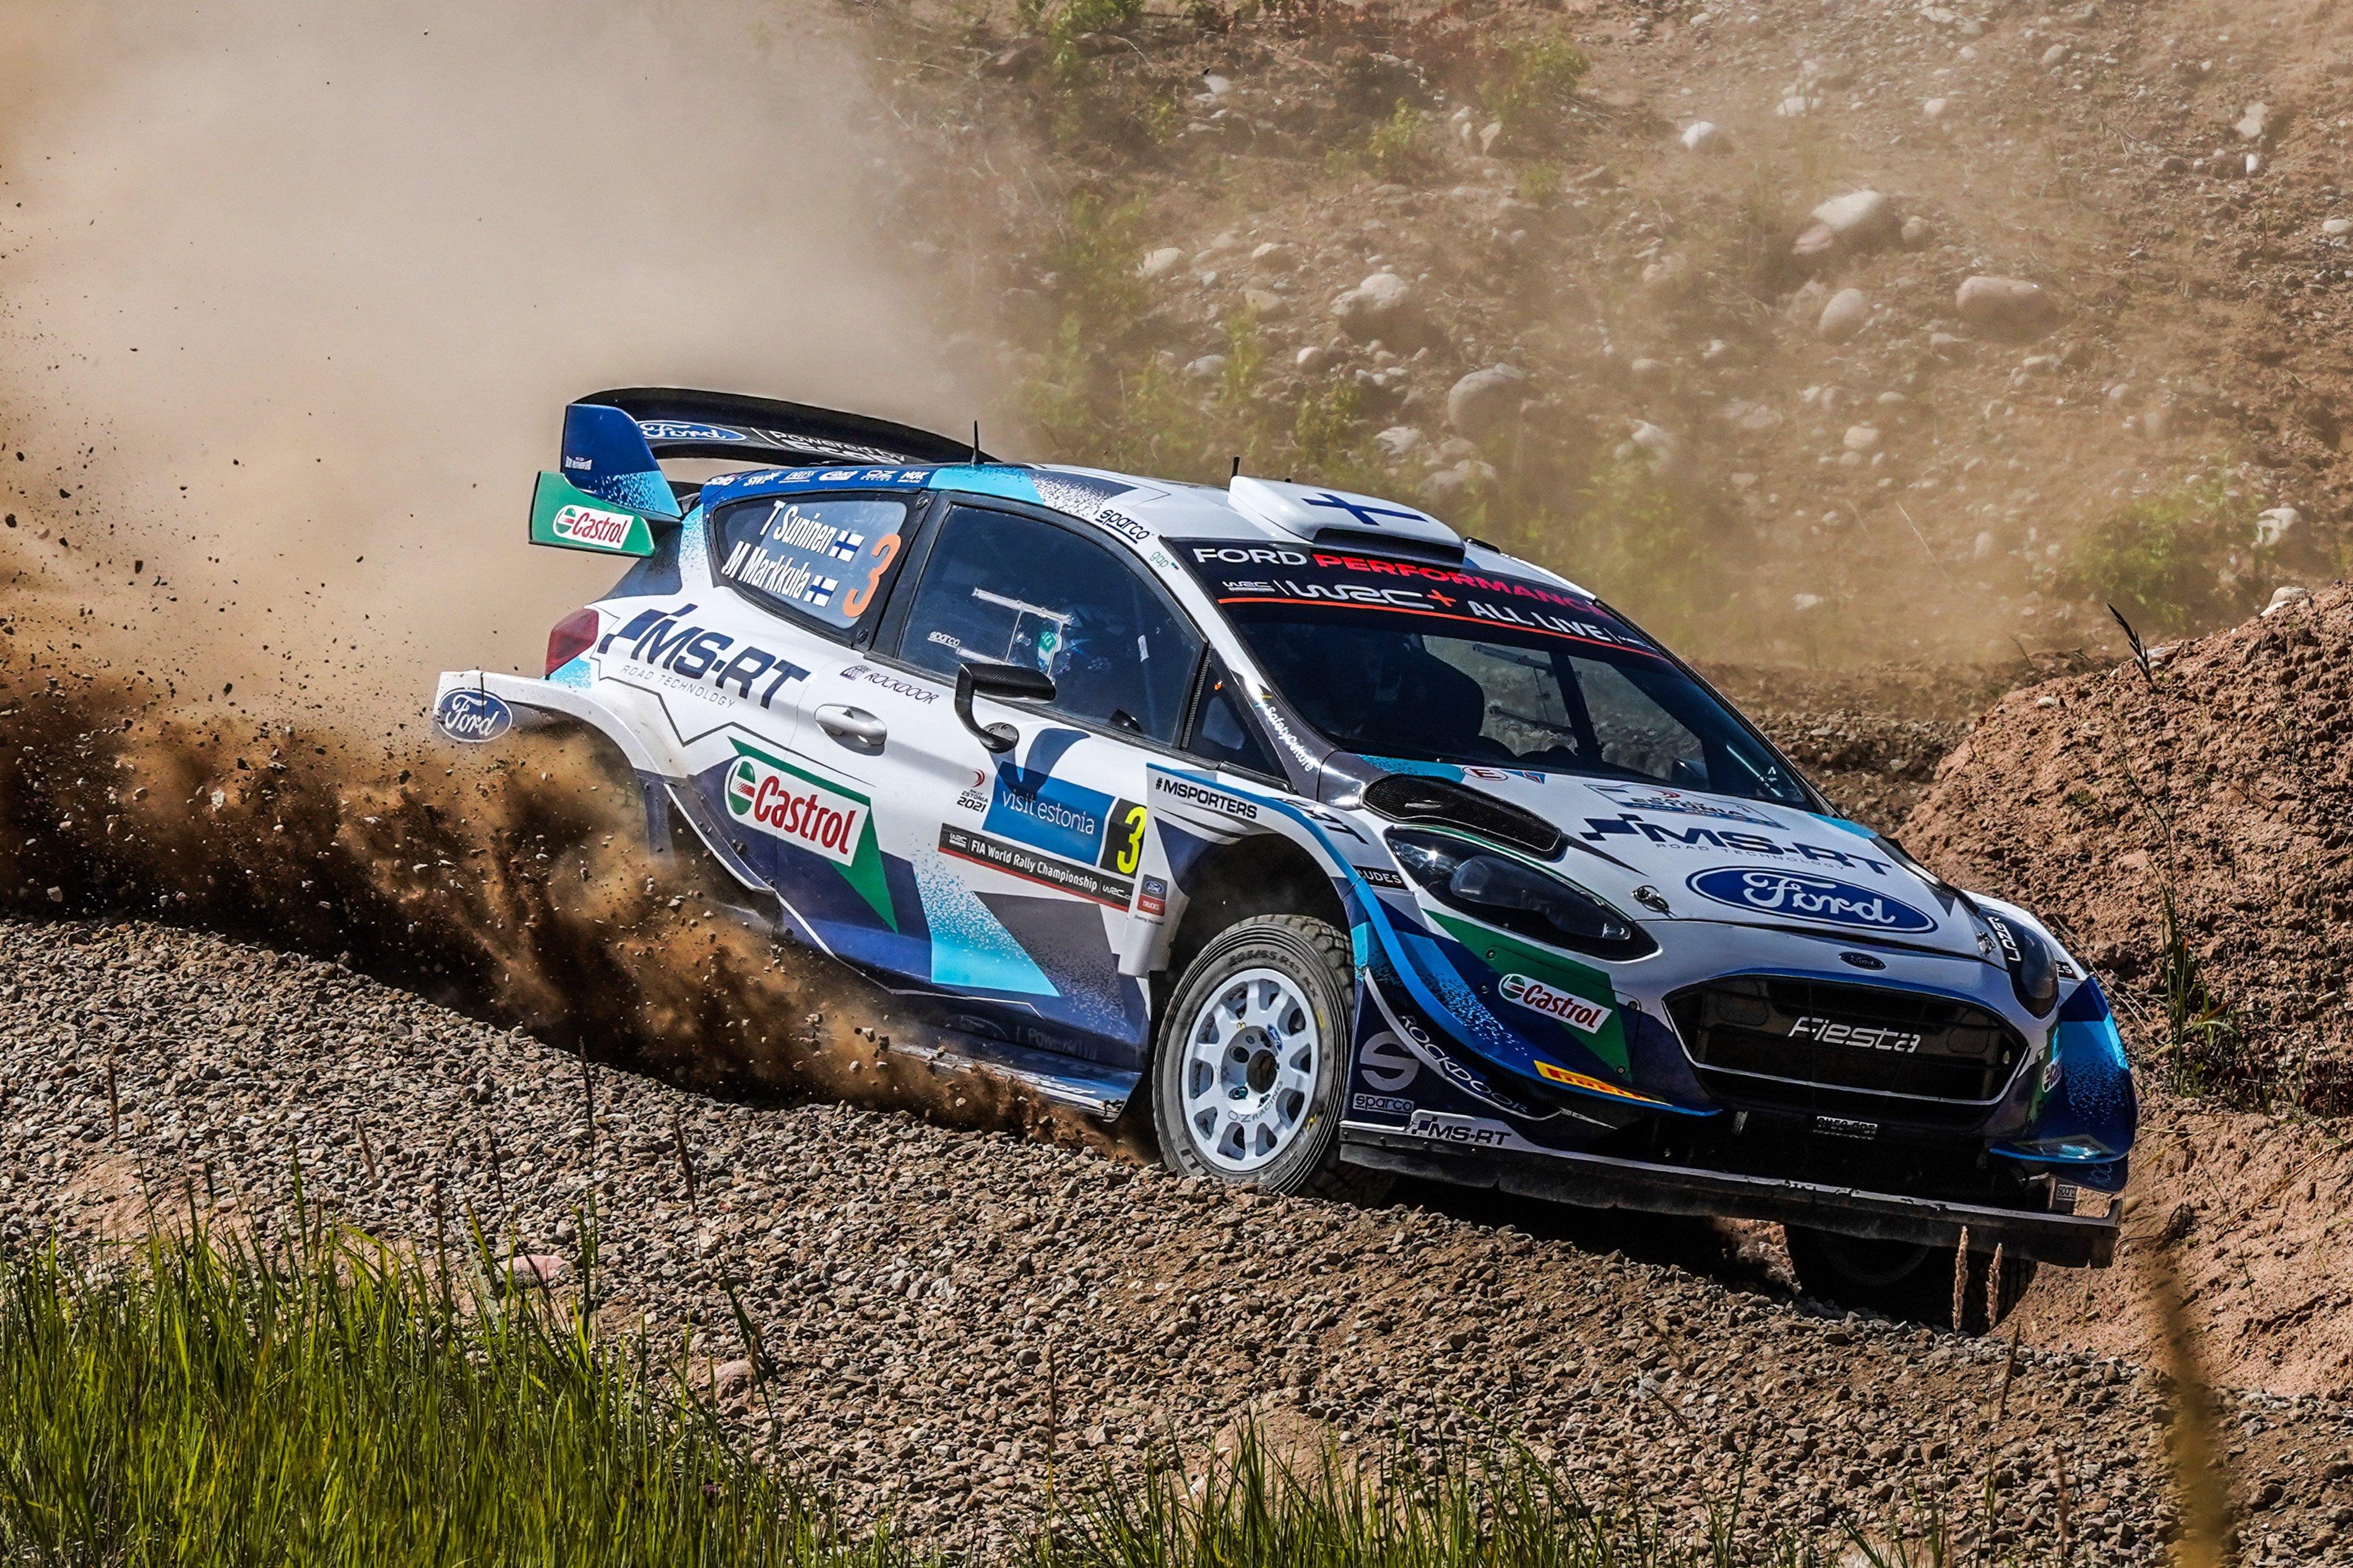 WRC: 11º Rally Estonia [15-18 Julio] - Página 3 E6lLpABXIAMeOm1?format=jpg&name=4096x4096